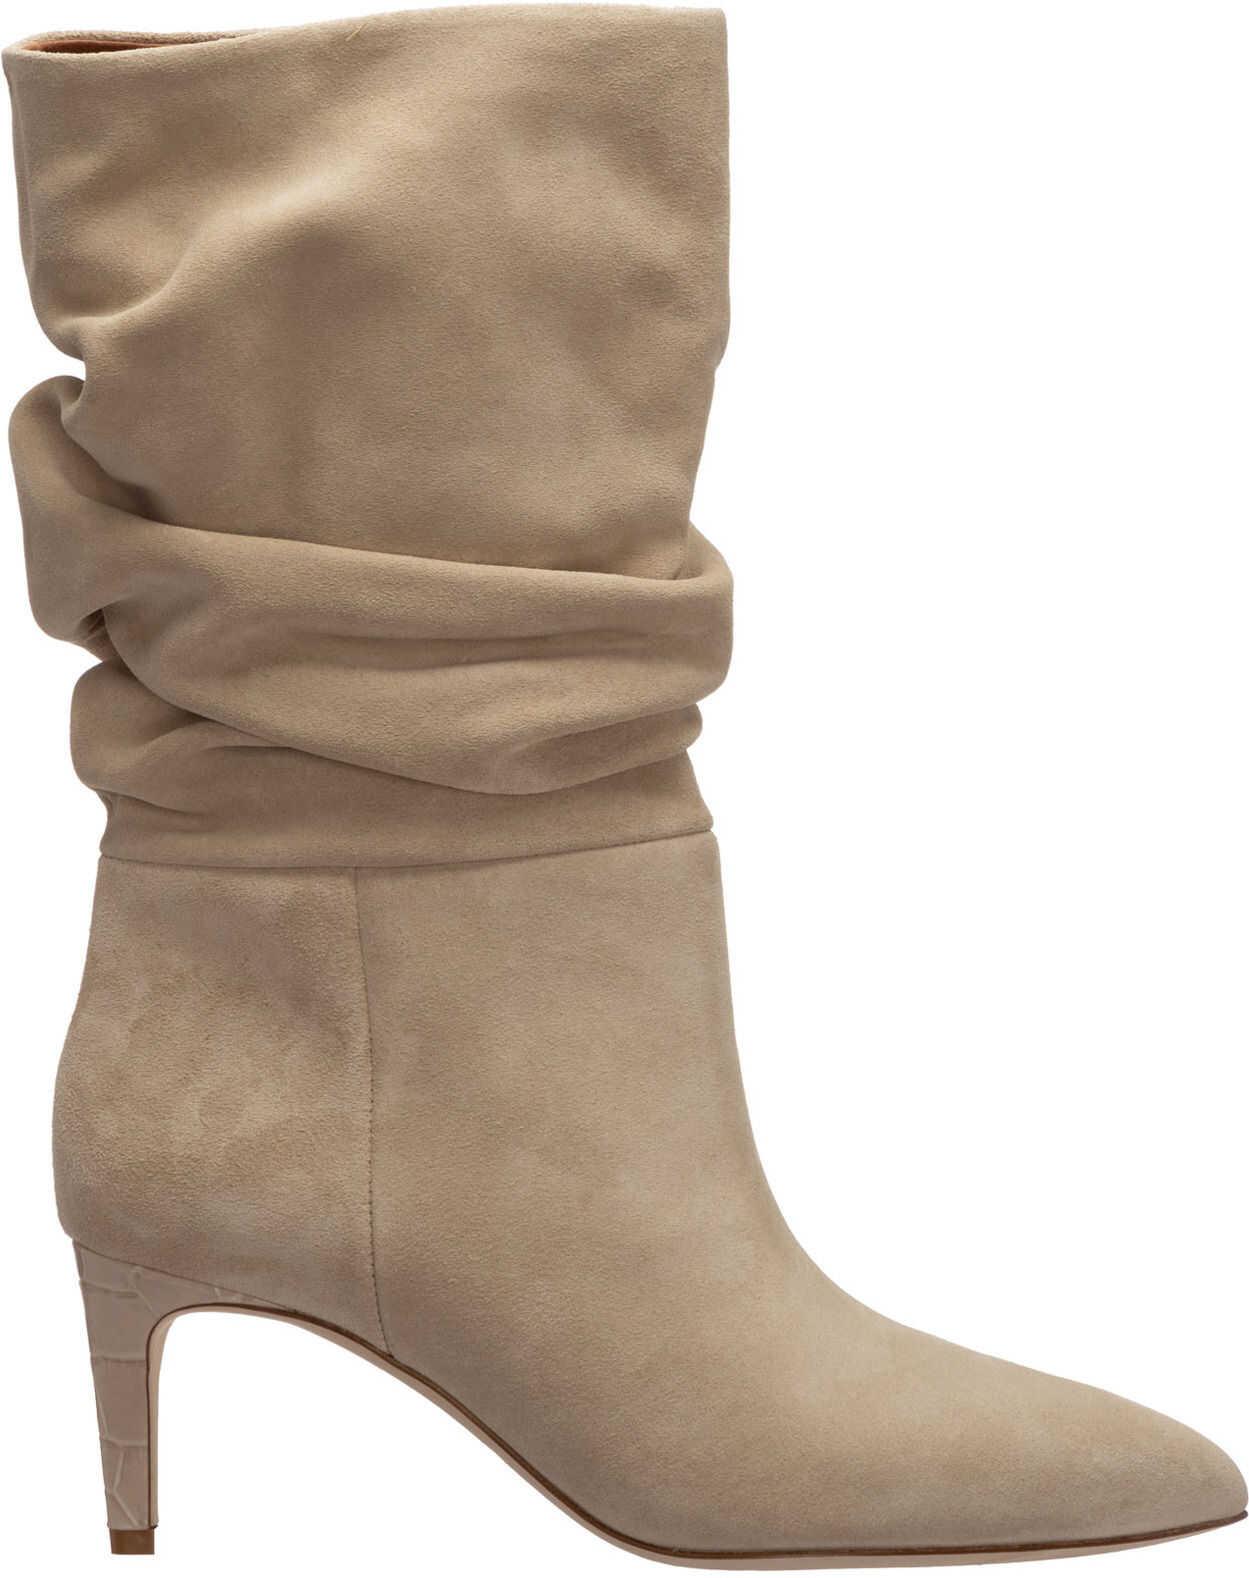 Paris Texas Heel Boots PX511 Beige imagine b-mall.ro